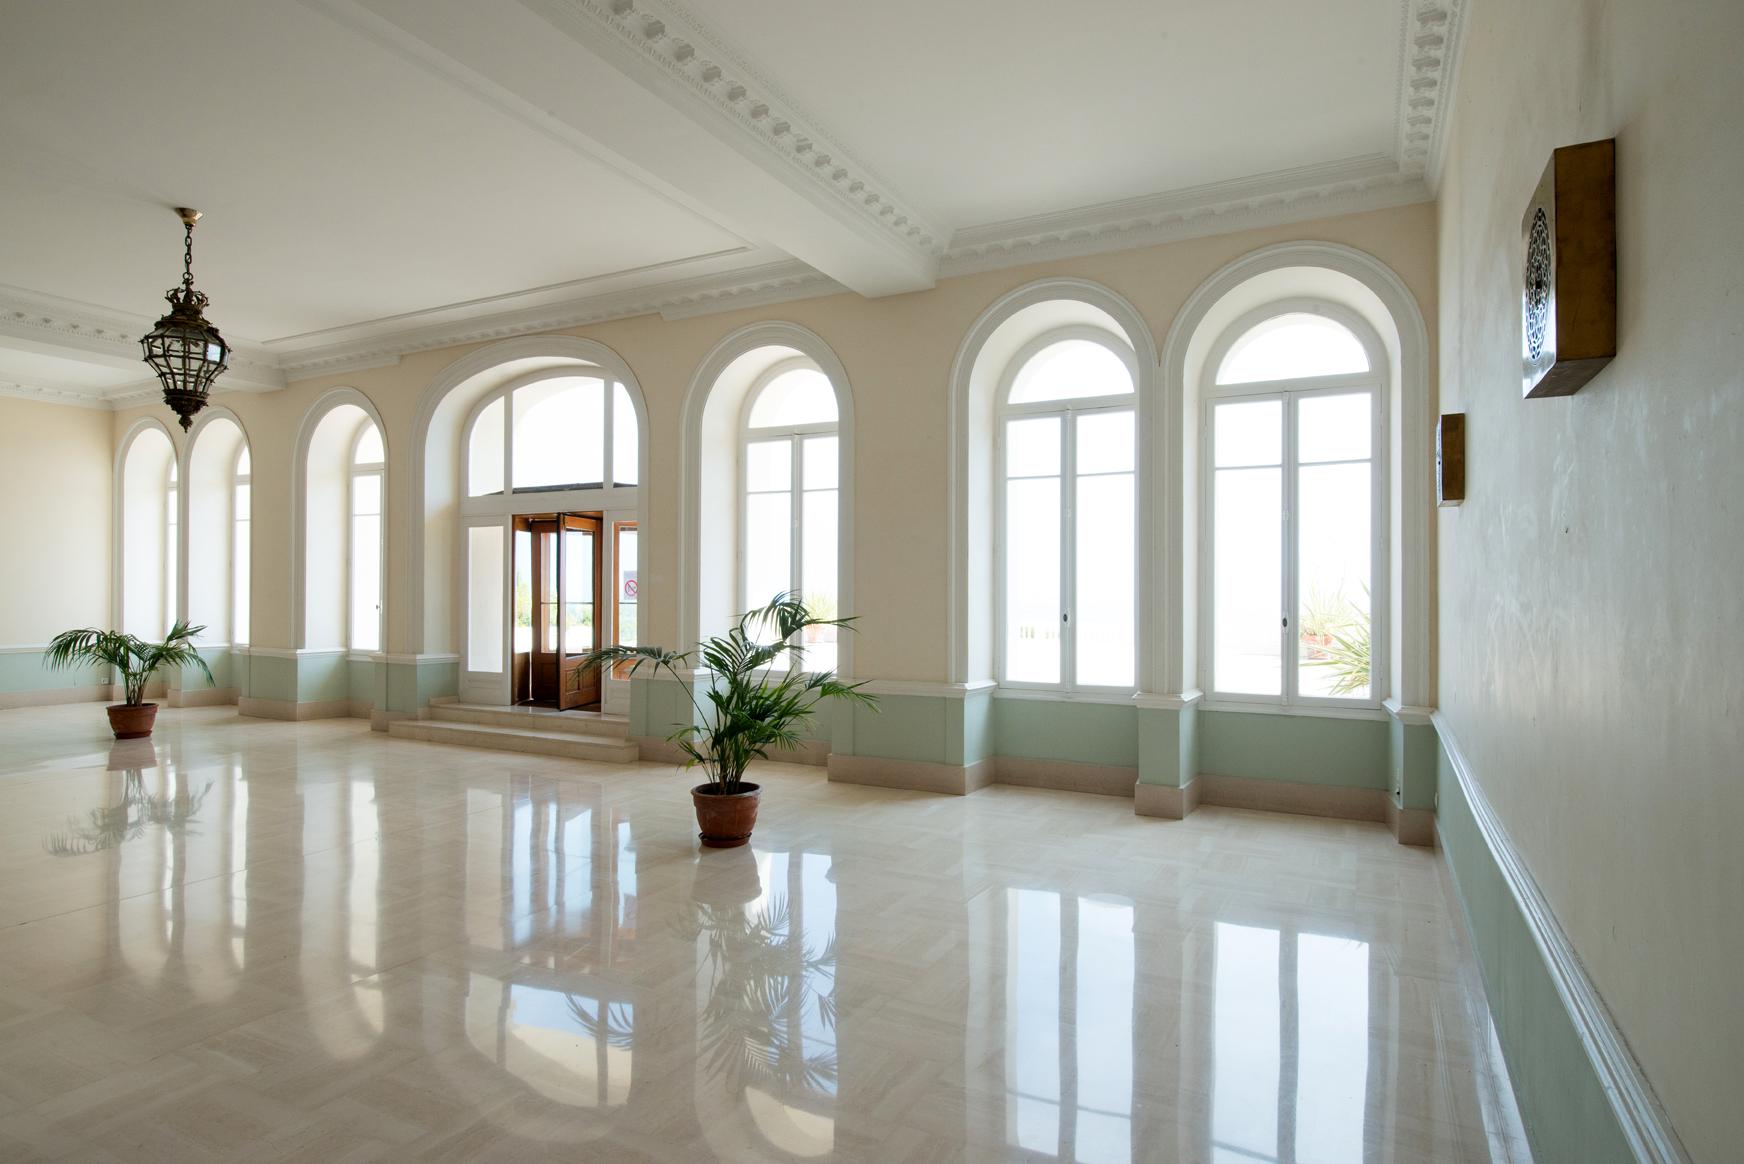 Résidence du Grand Hotel Cap Martin